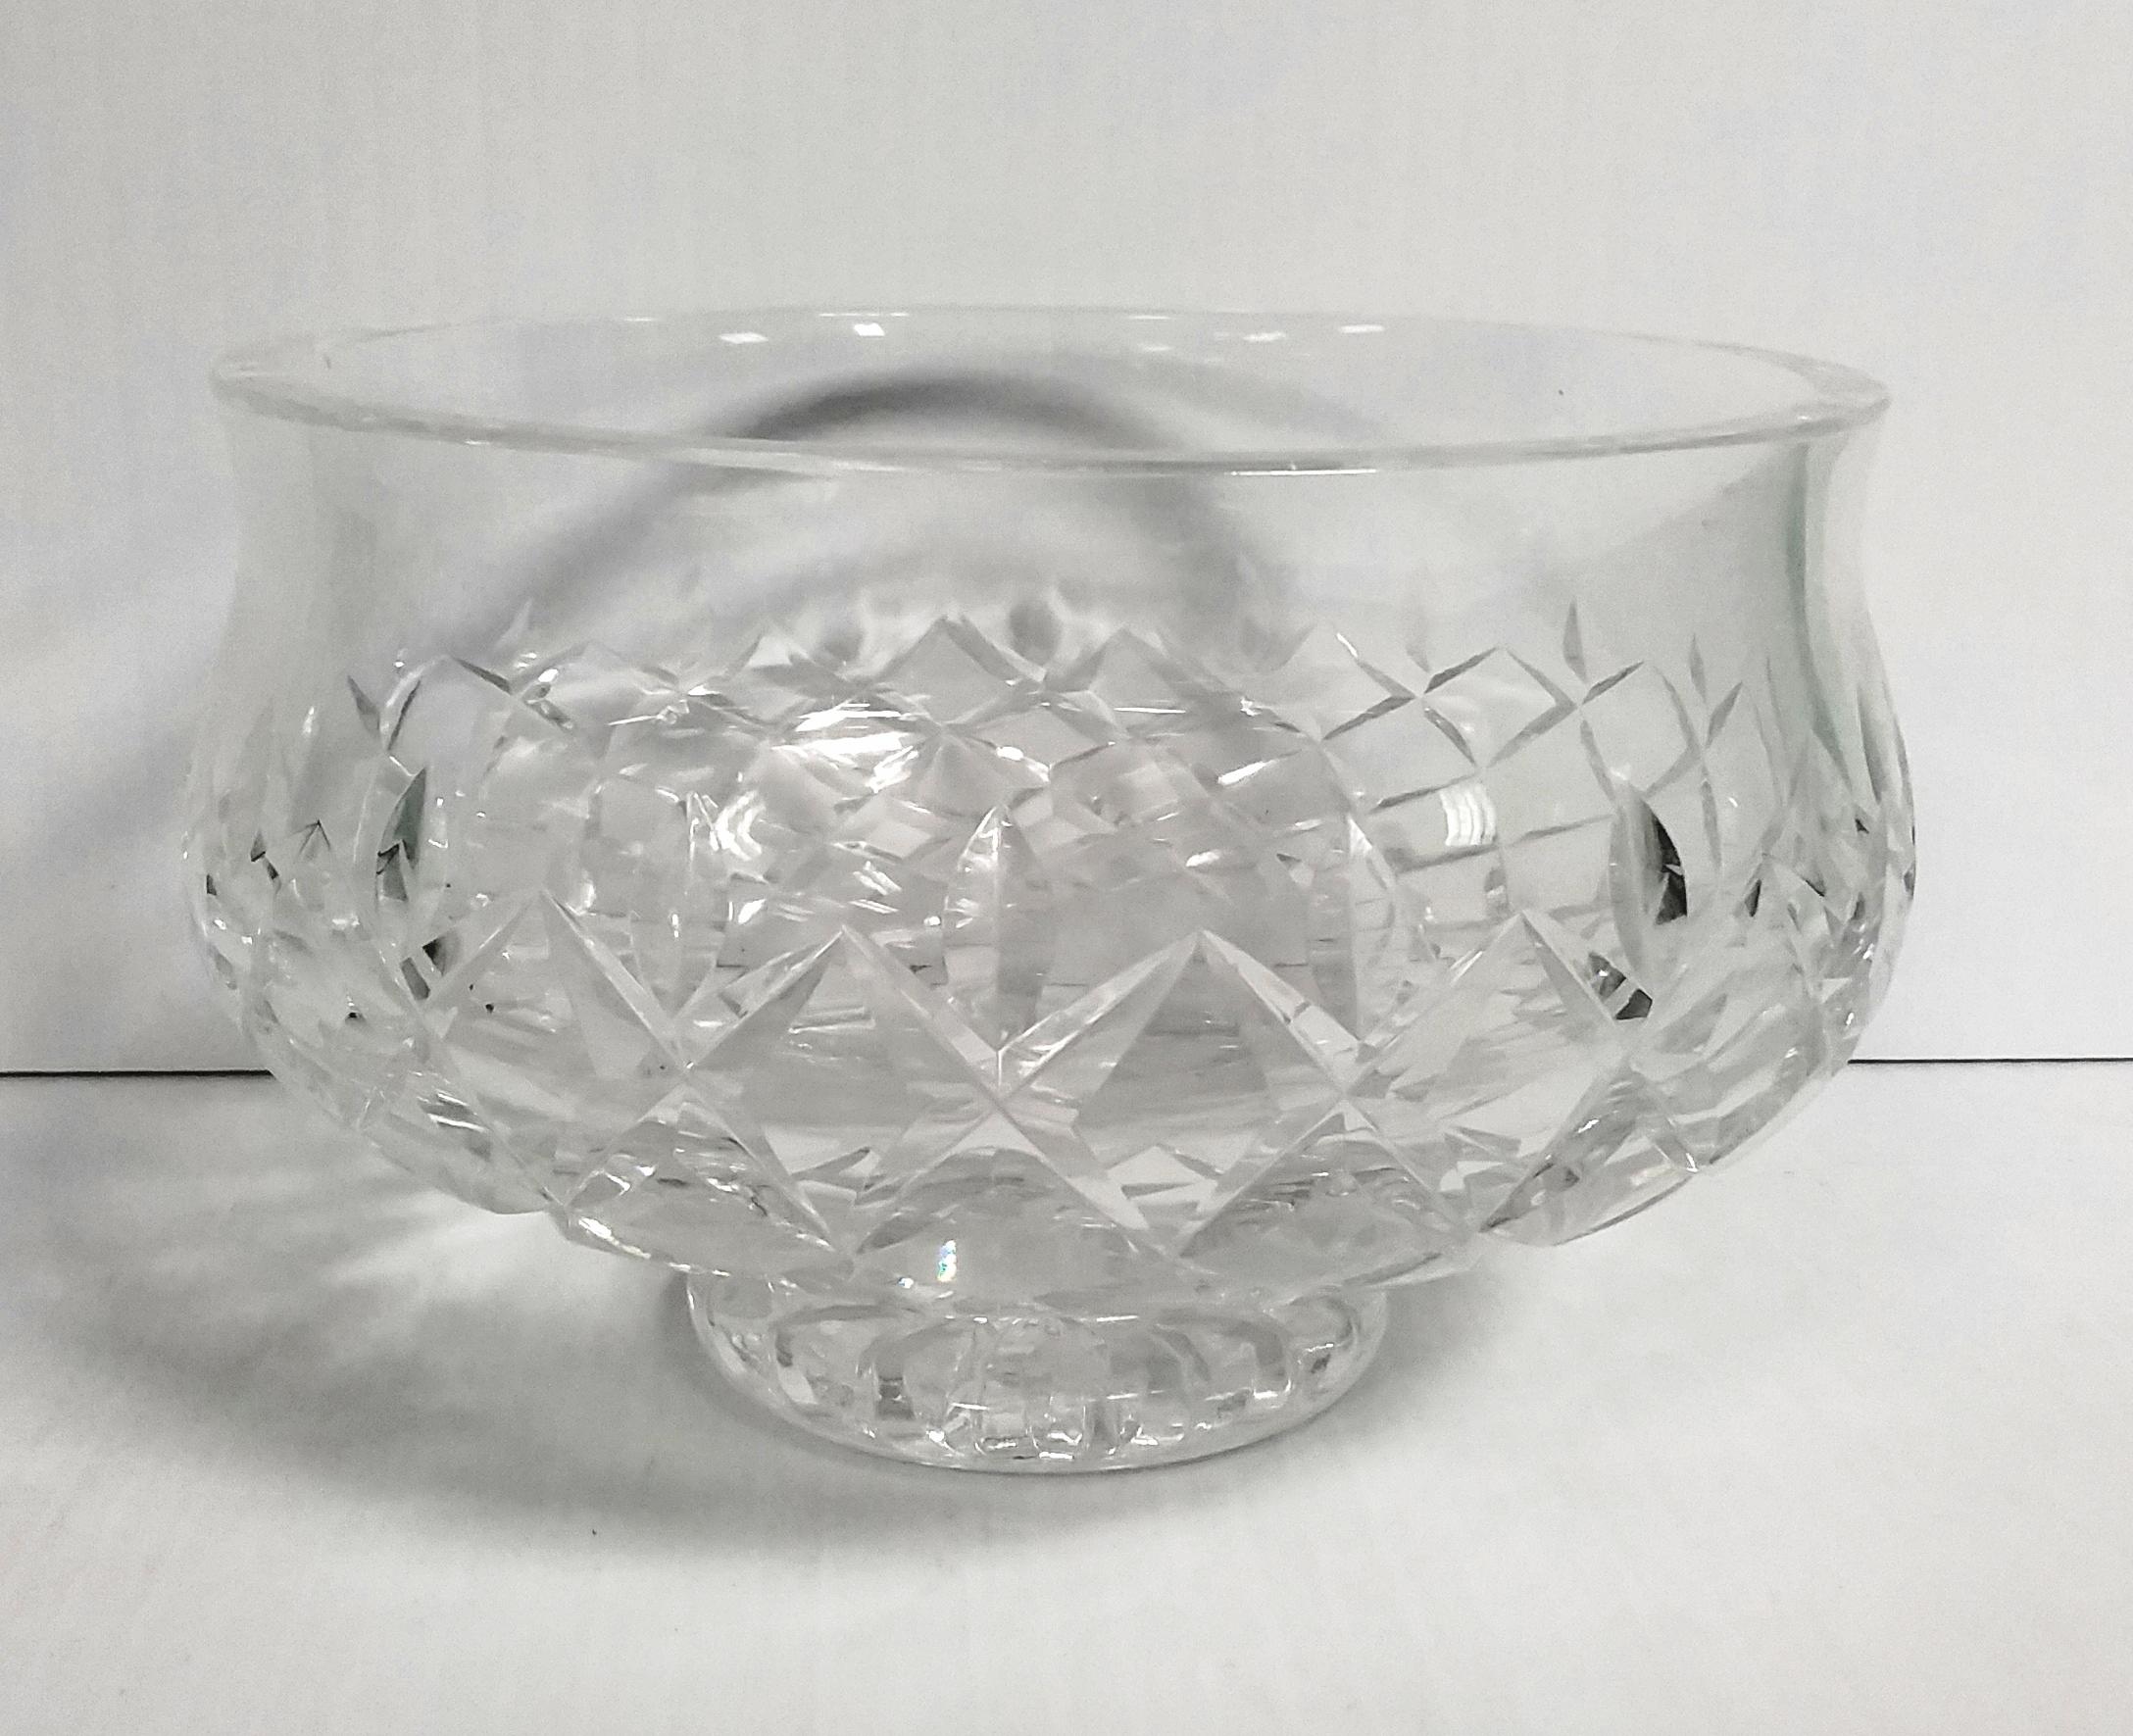 Waterford_Crystal_Bowl